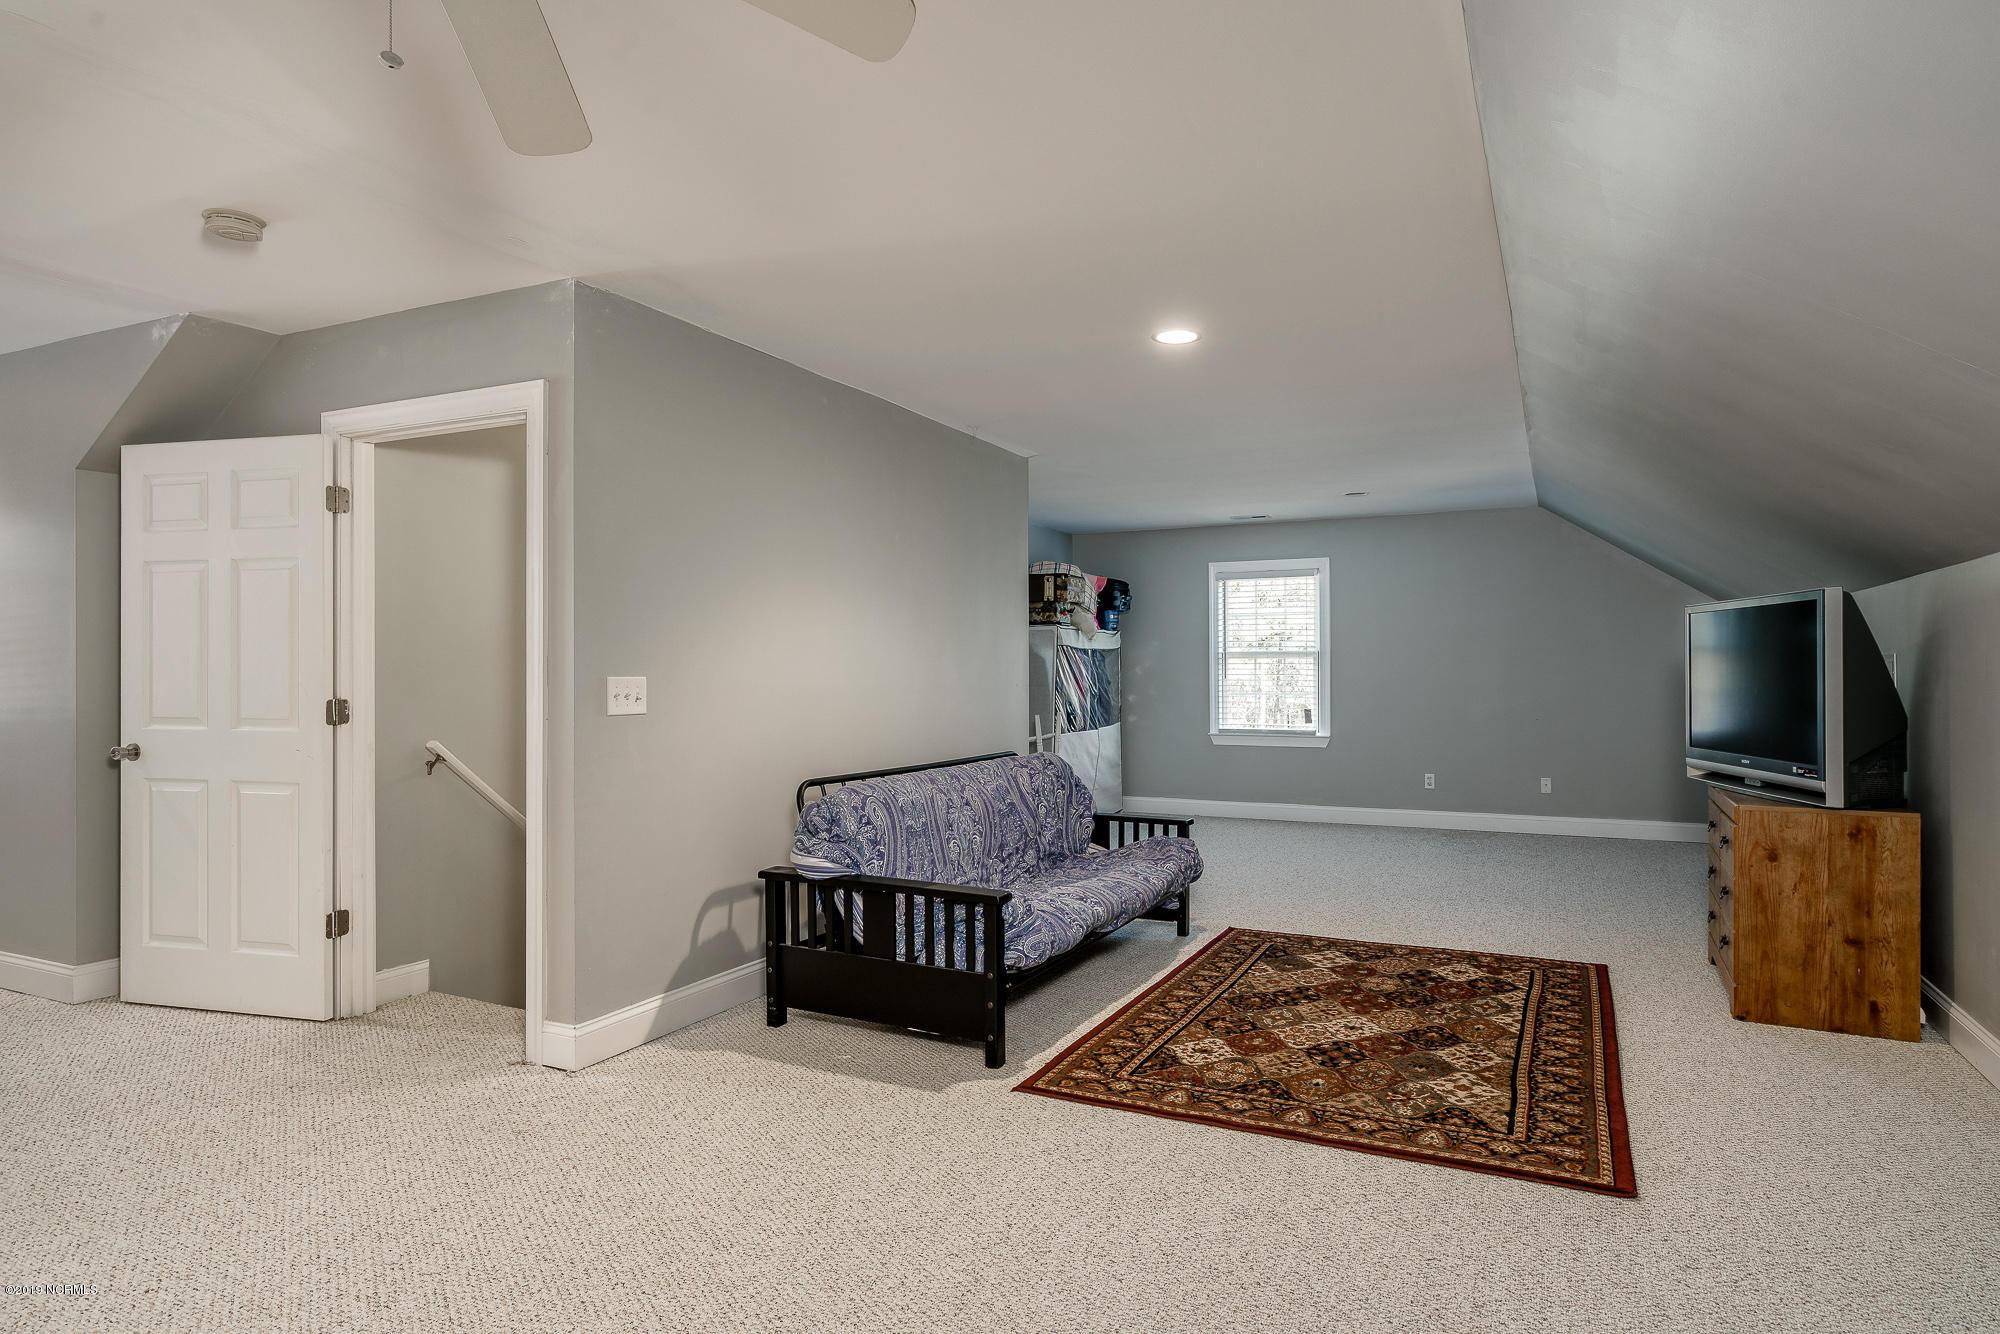 155 Otway Farm Road, Beaufort, North Carolina 28516, 2 Bedrooms Bedrooms, 8 Rooms Rooms,2 BathroomsBathrooms,Single family residence,For sale,Otway Farm,100150020